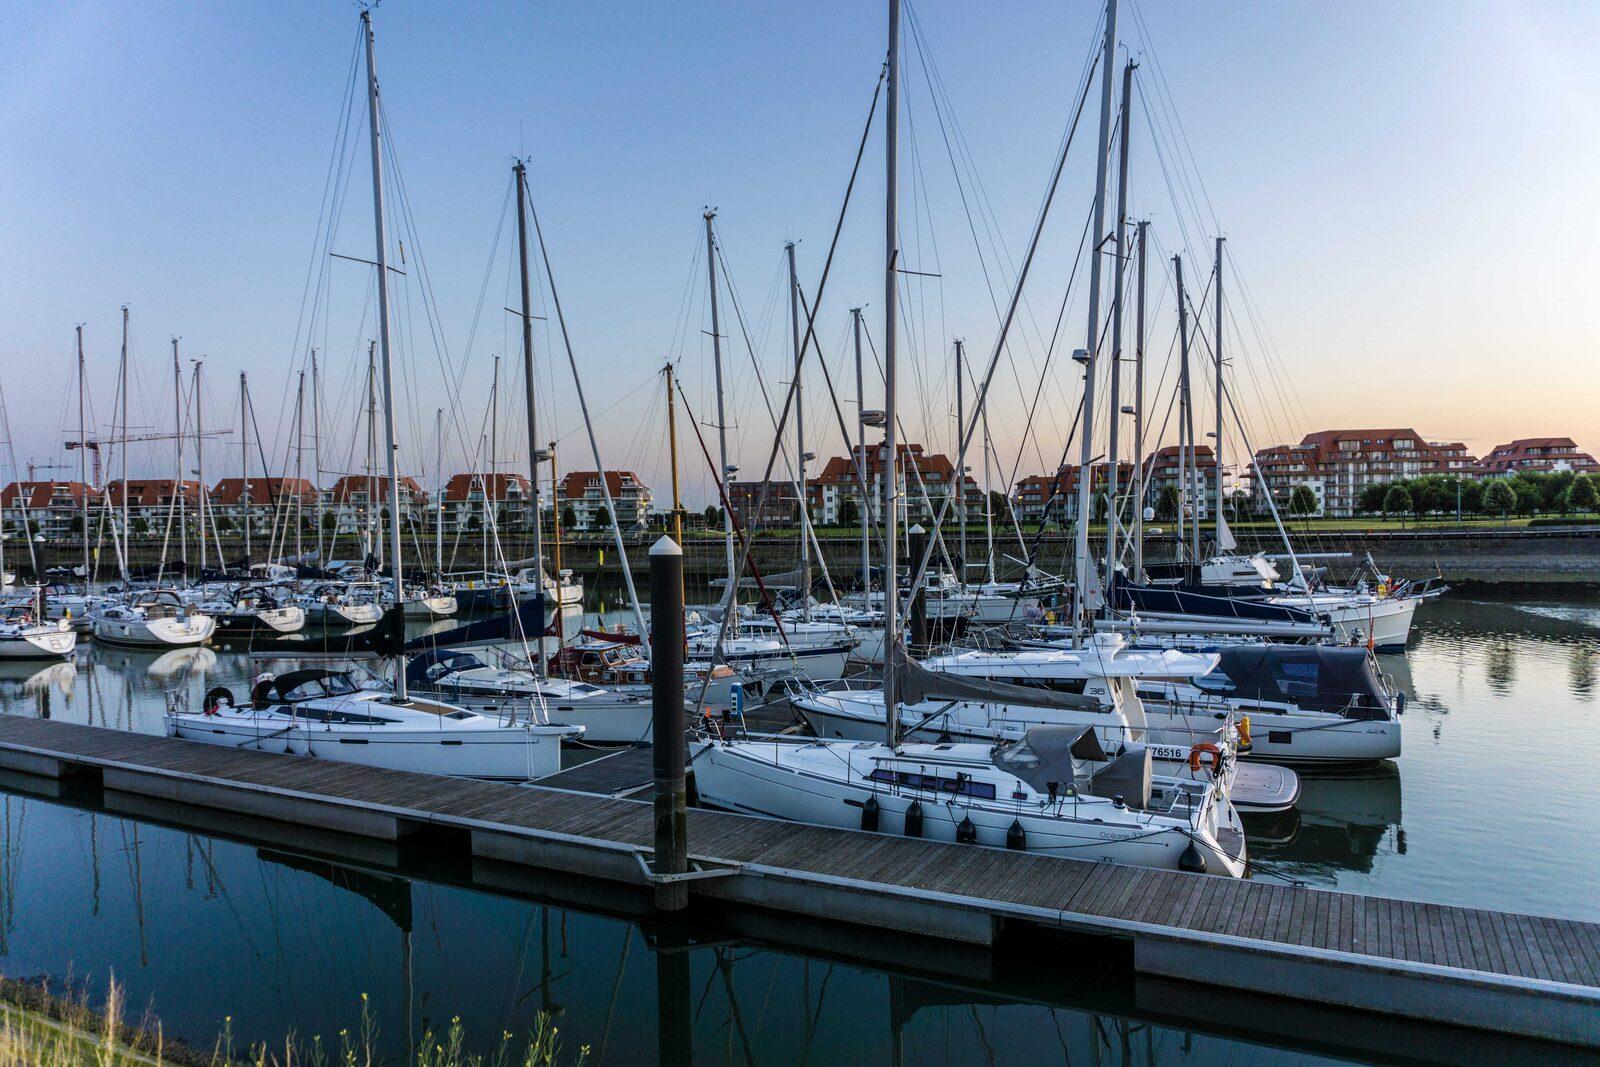 The extensive marina